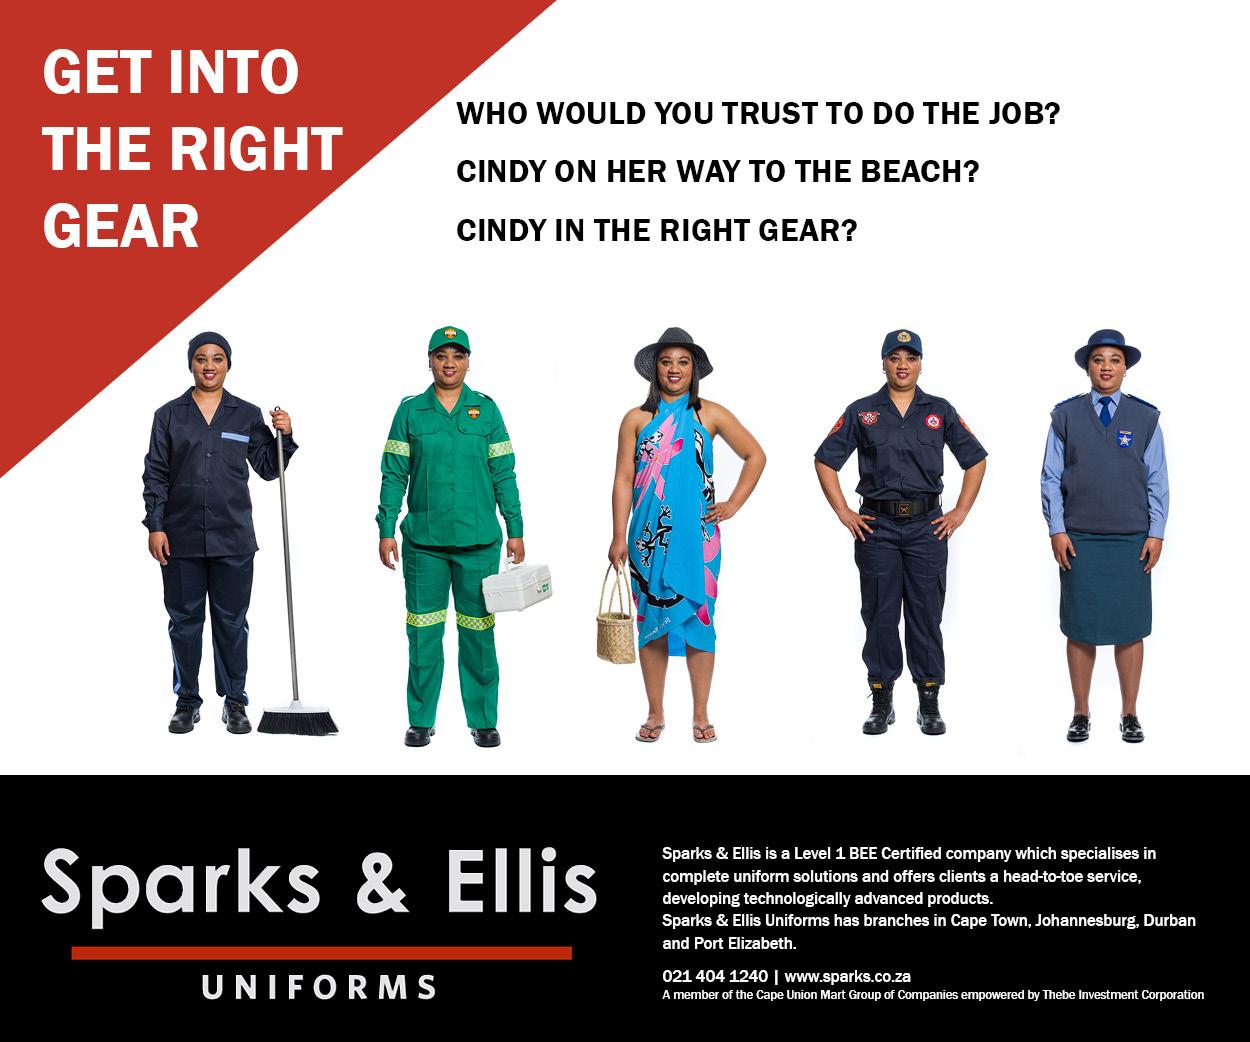 Welcome to Sparks & Ellis - Sparks